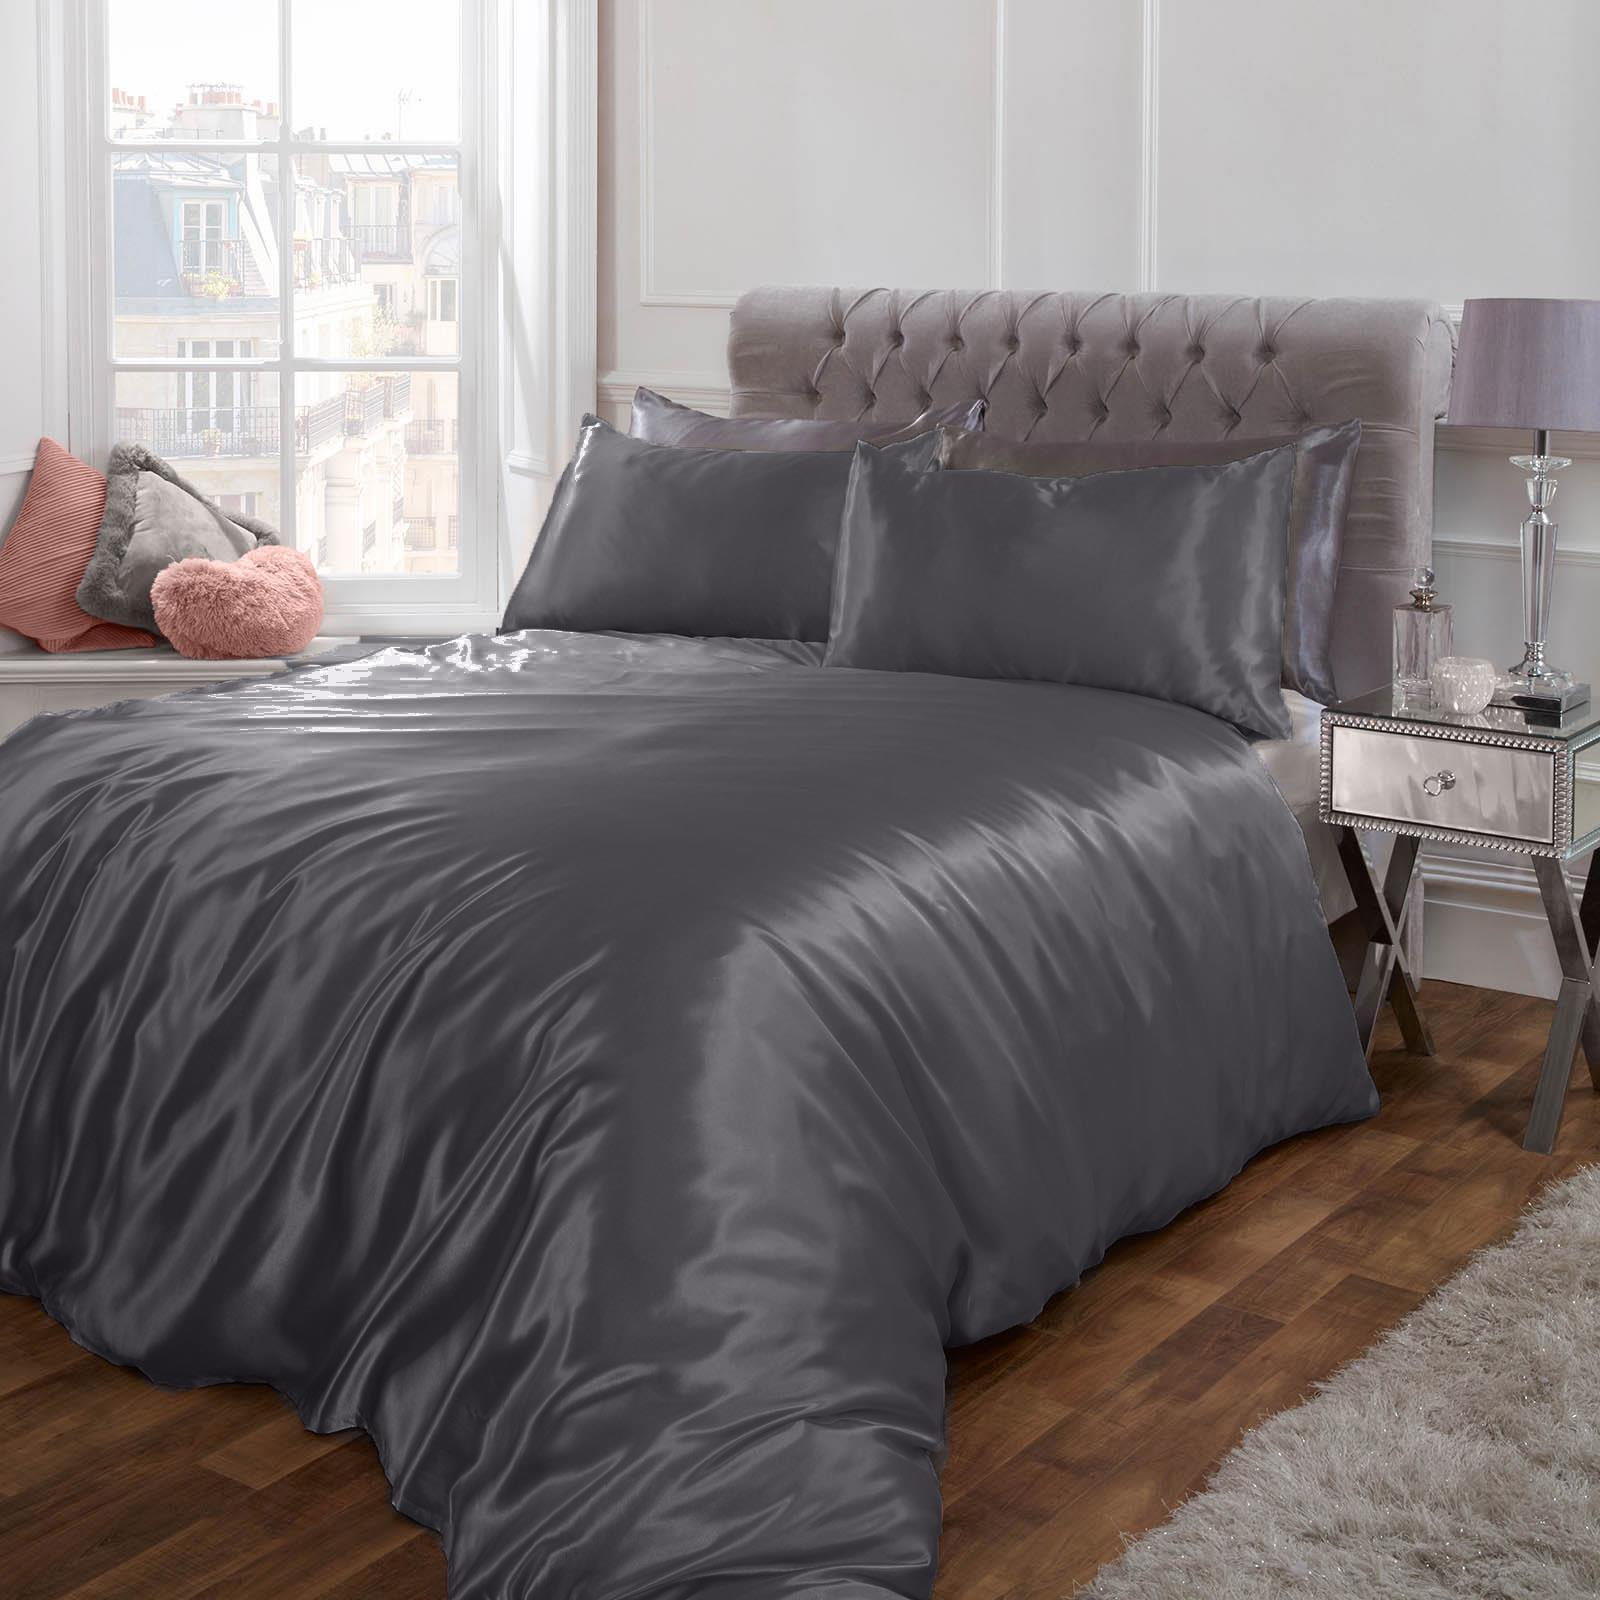 thumbnail 20 - Sienna Satin Silk Duvet Cover with Pillowcases Bedding Set, Blush Pink Silver